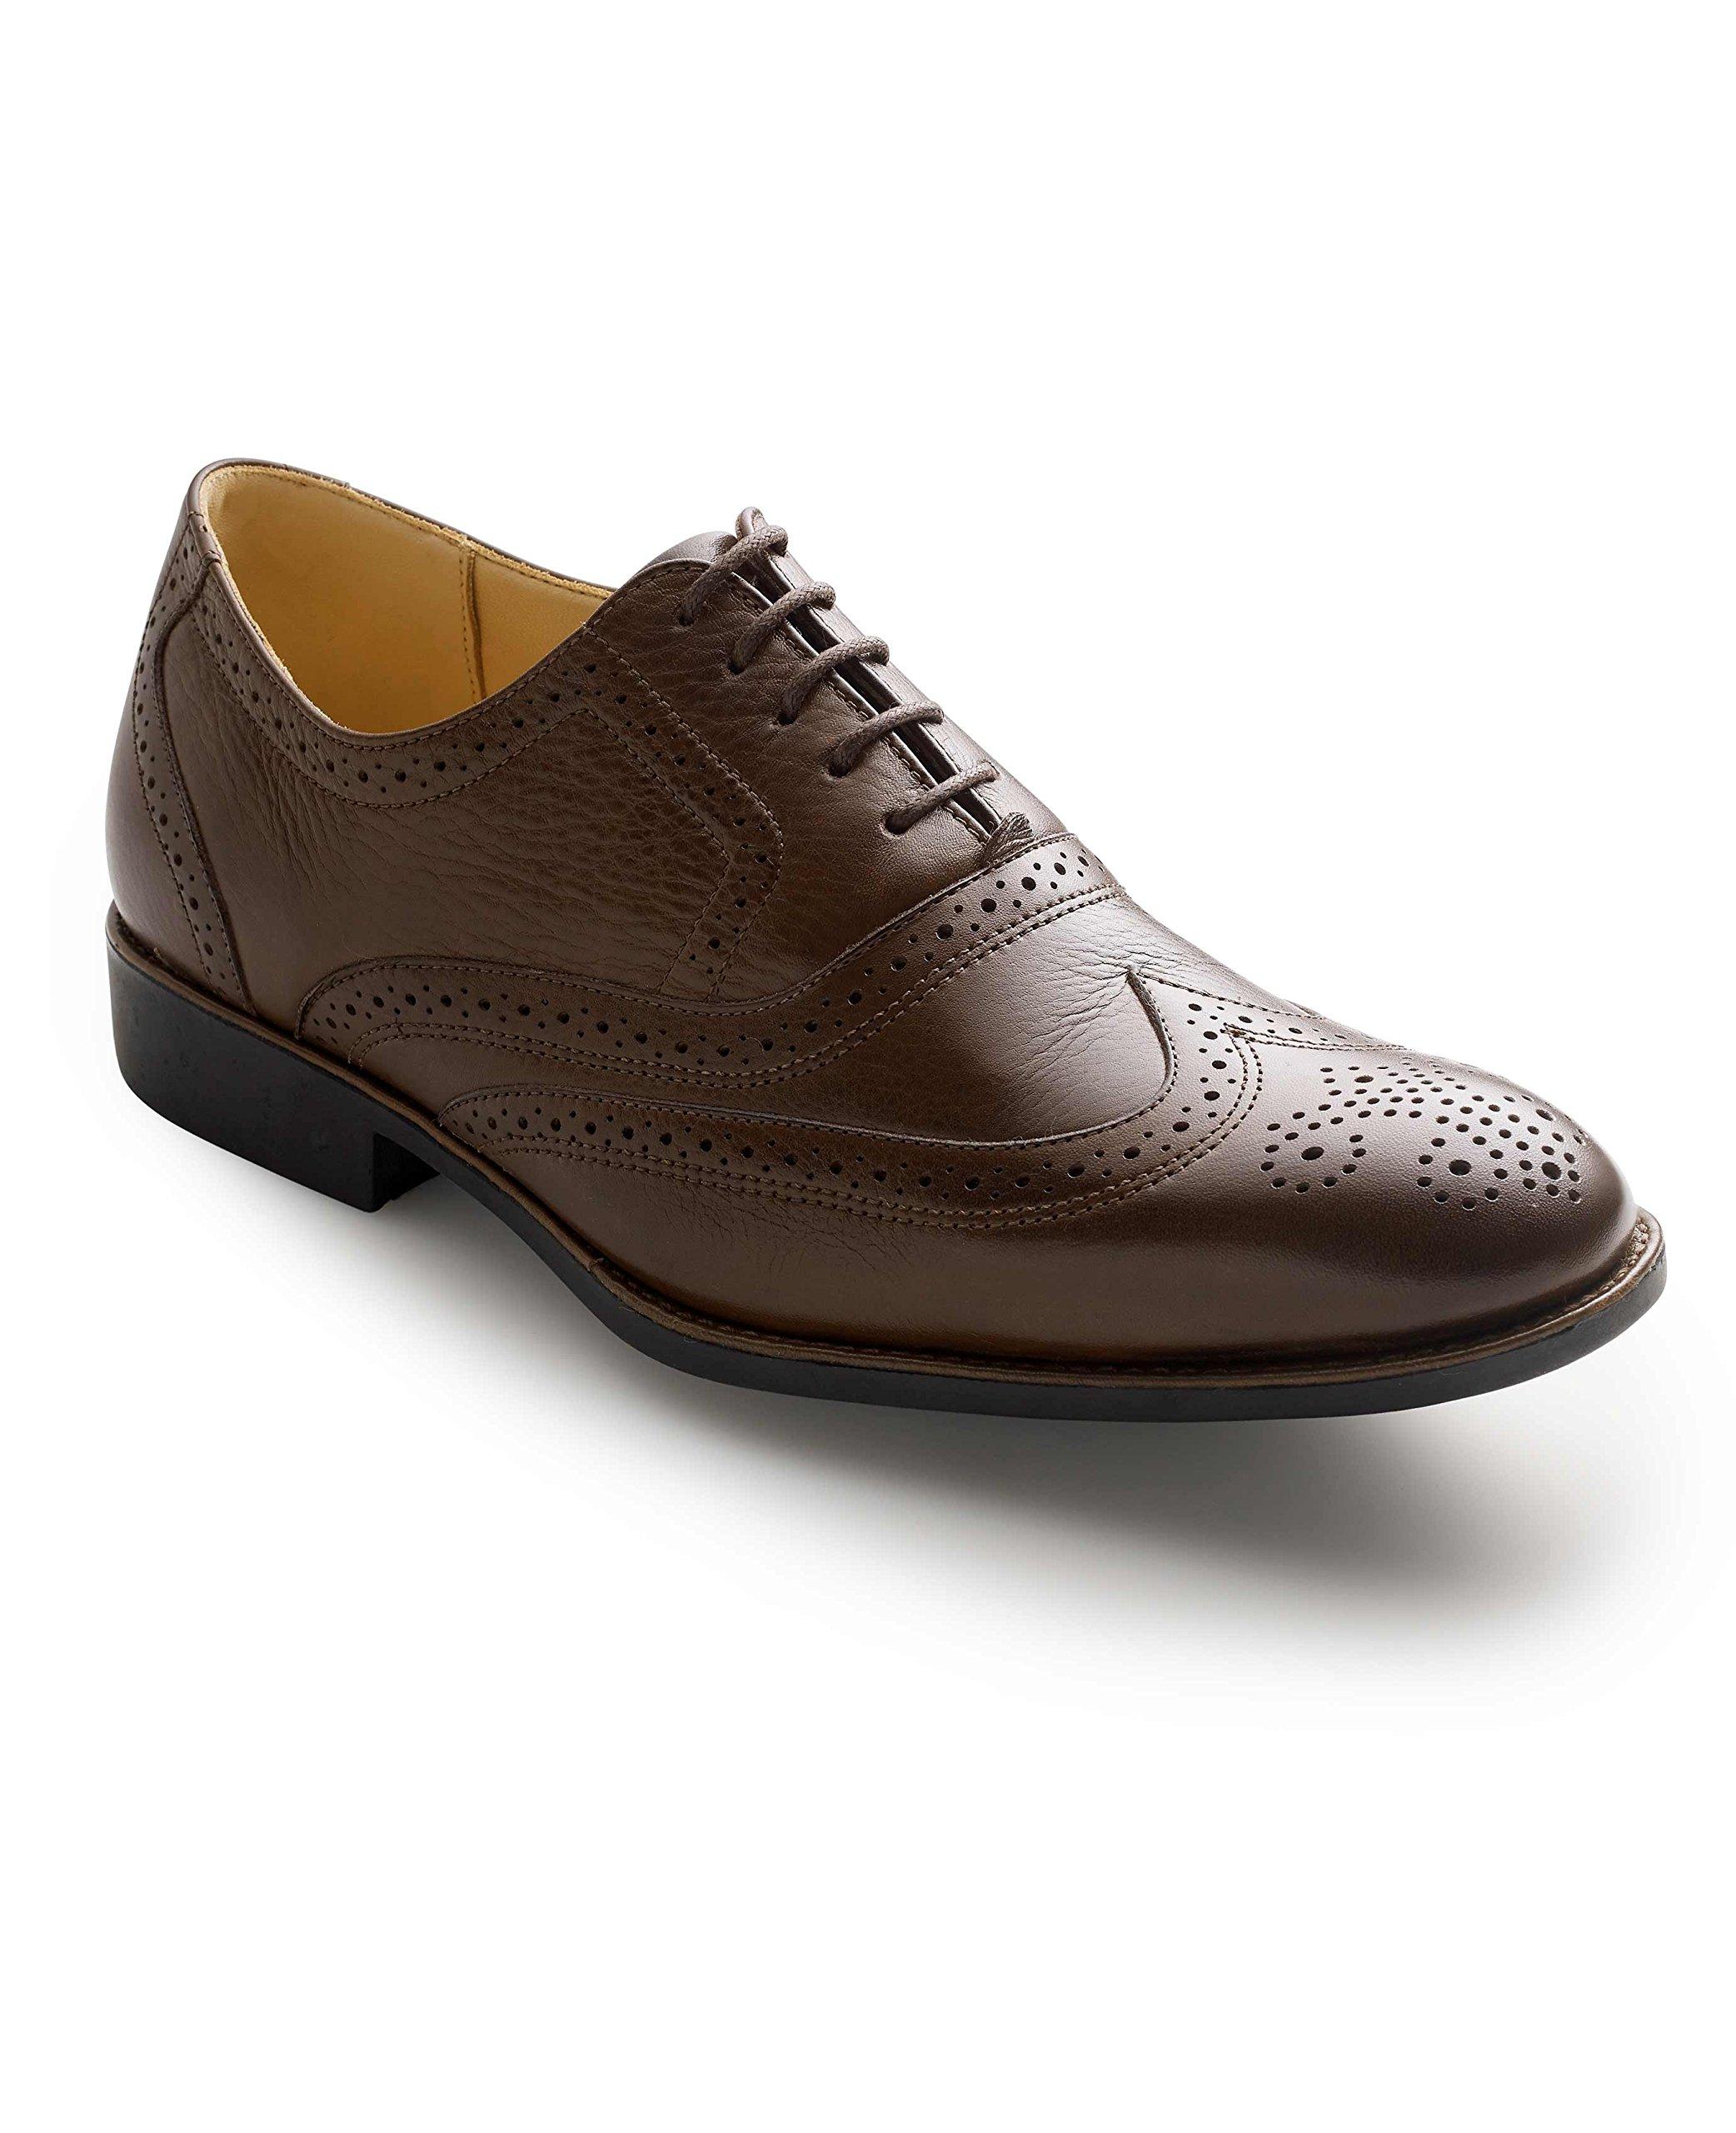 Savile Row Men's Deep Brown Leather Full Brogue Shoes 12